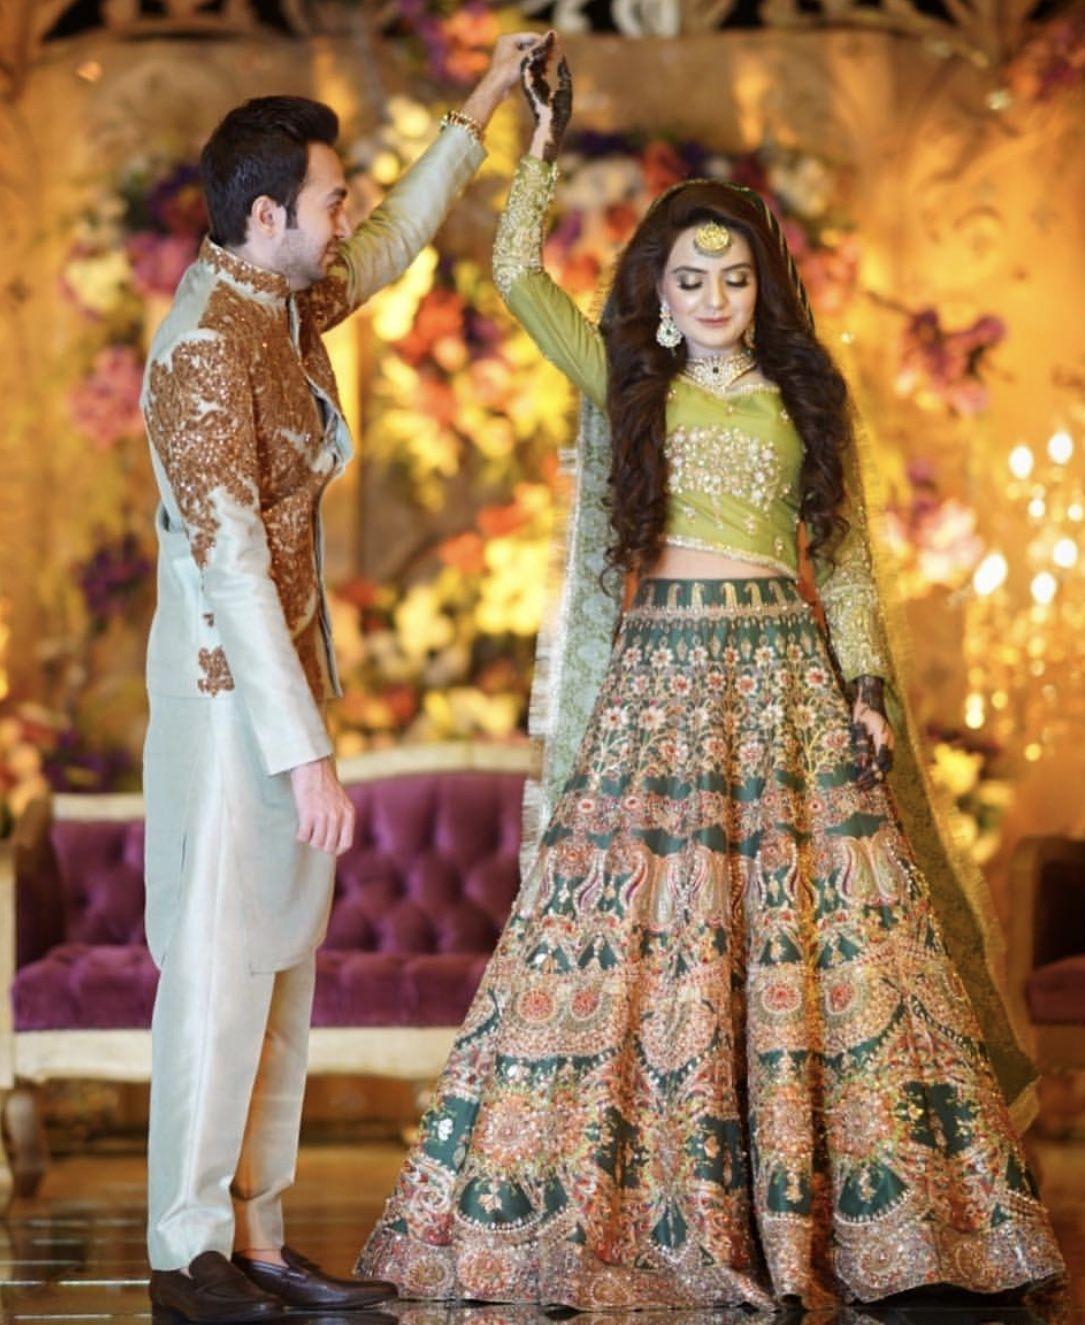 Mehndi Desi Wedding Dresses Pakistani Bridal Dresses Pakistani Wedding Dresses In 2020 Pakistani Bridal Dresses Bridal Mehndi Dresses Pakistani Wedding Outfits